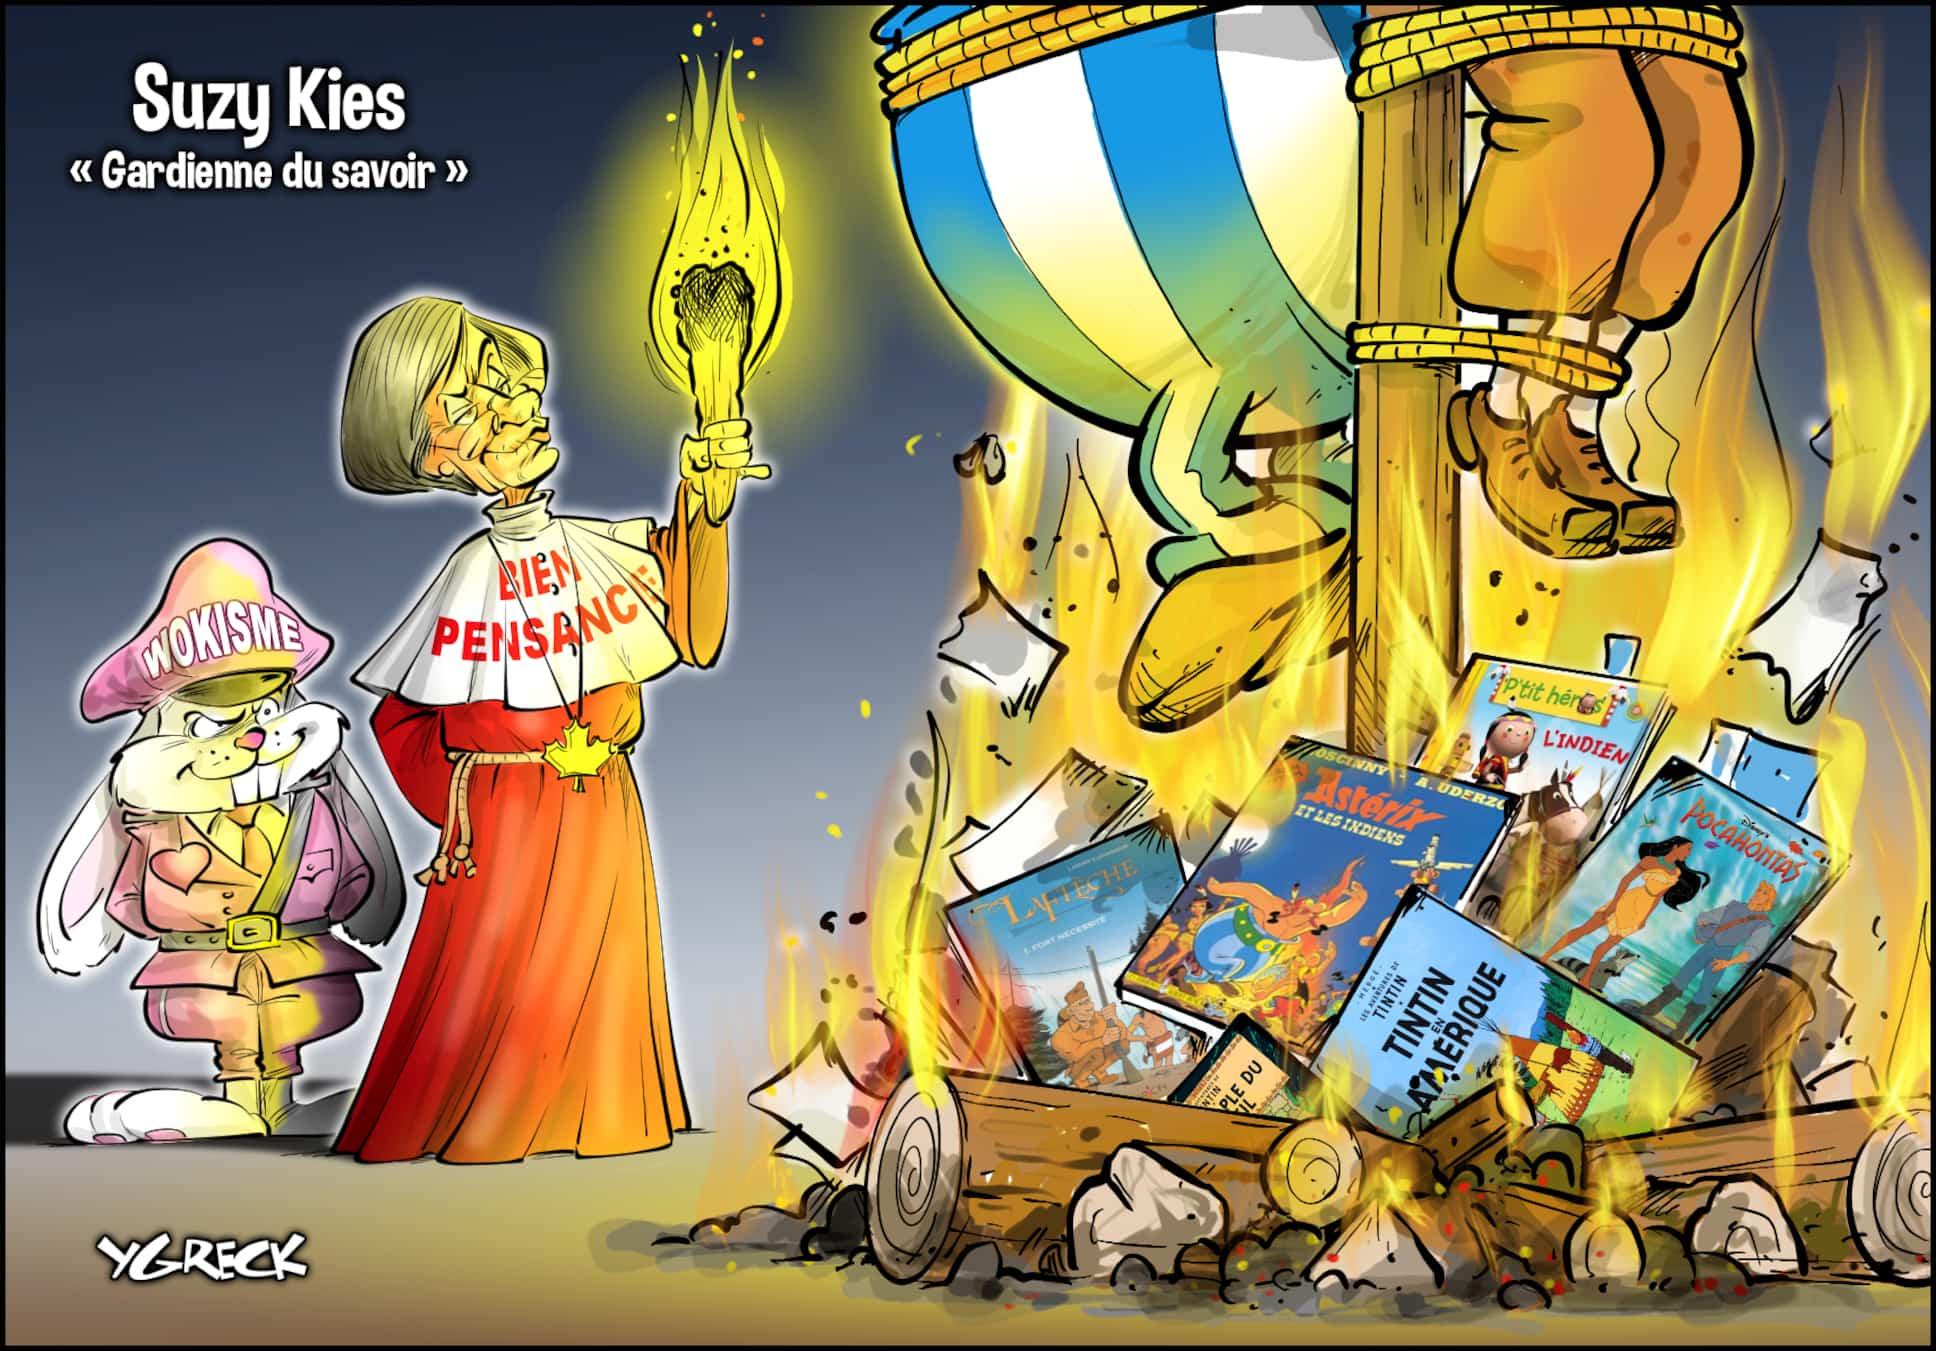 CARICATURES : politiques, judiciaires, sportives ... etc.    (suite 2) - Page 25 Suzy_Kies_copie1db97a57-9c38-4e00-b3ff-352e0a9d8f49_ORIGINAL